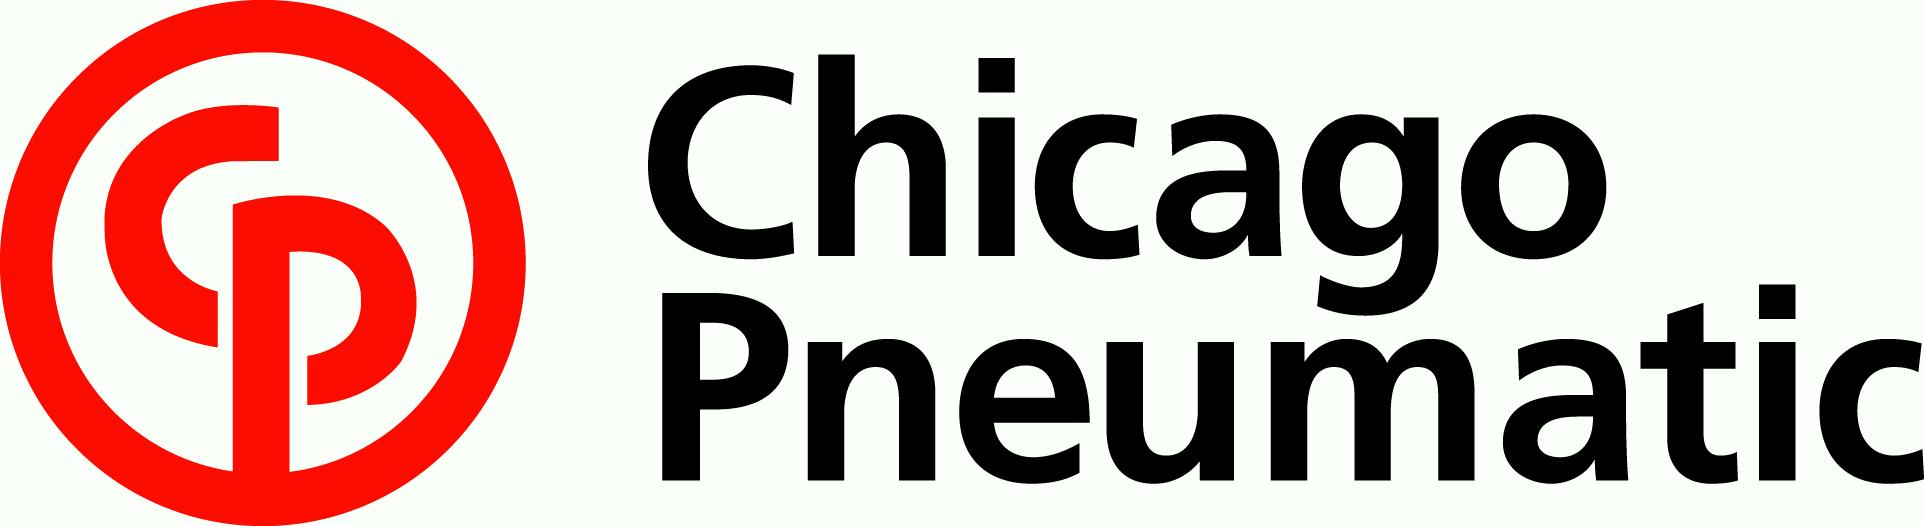 Logo-Chicago-Pneumatic